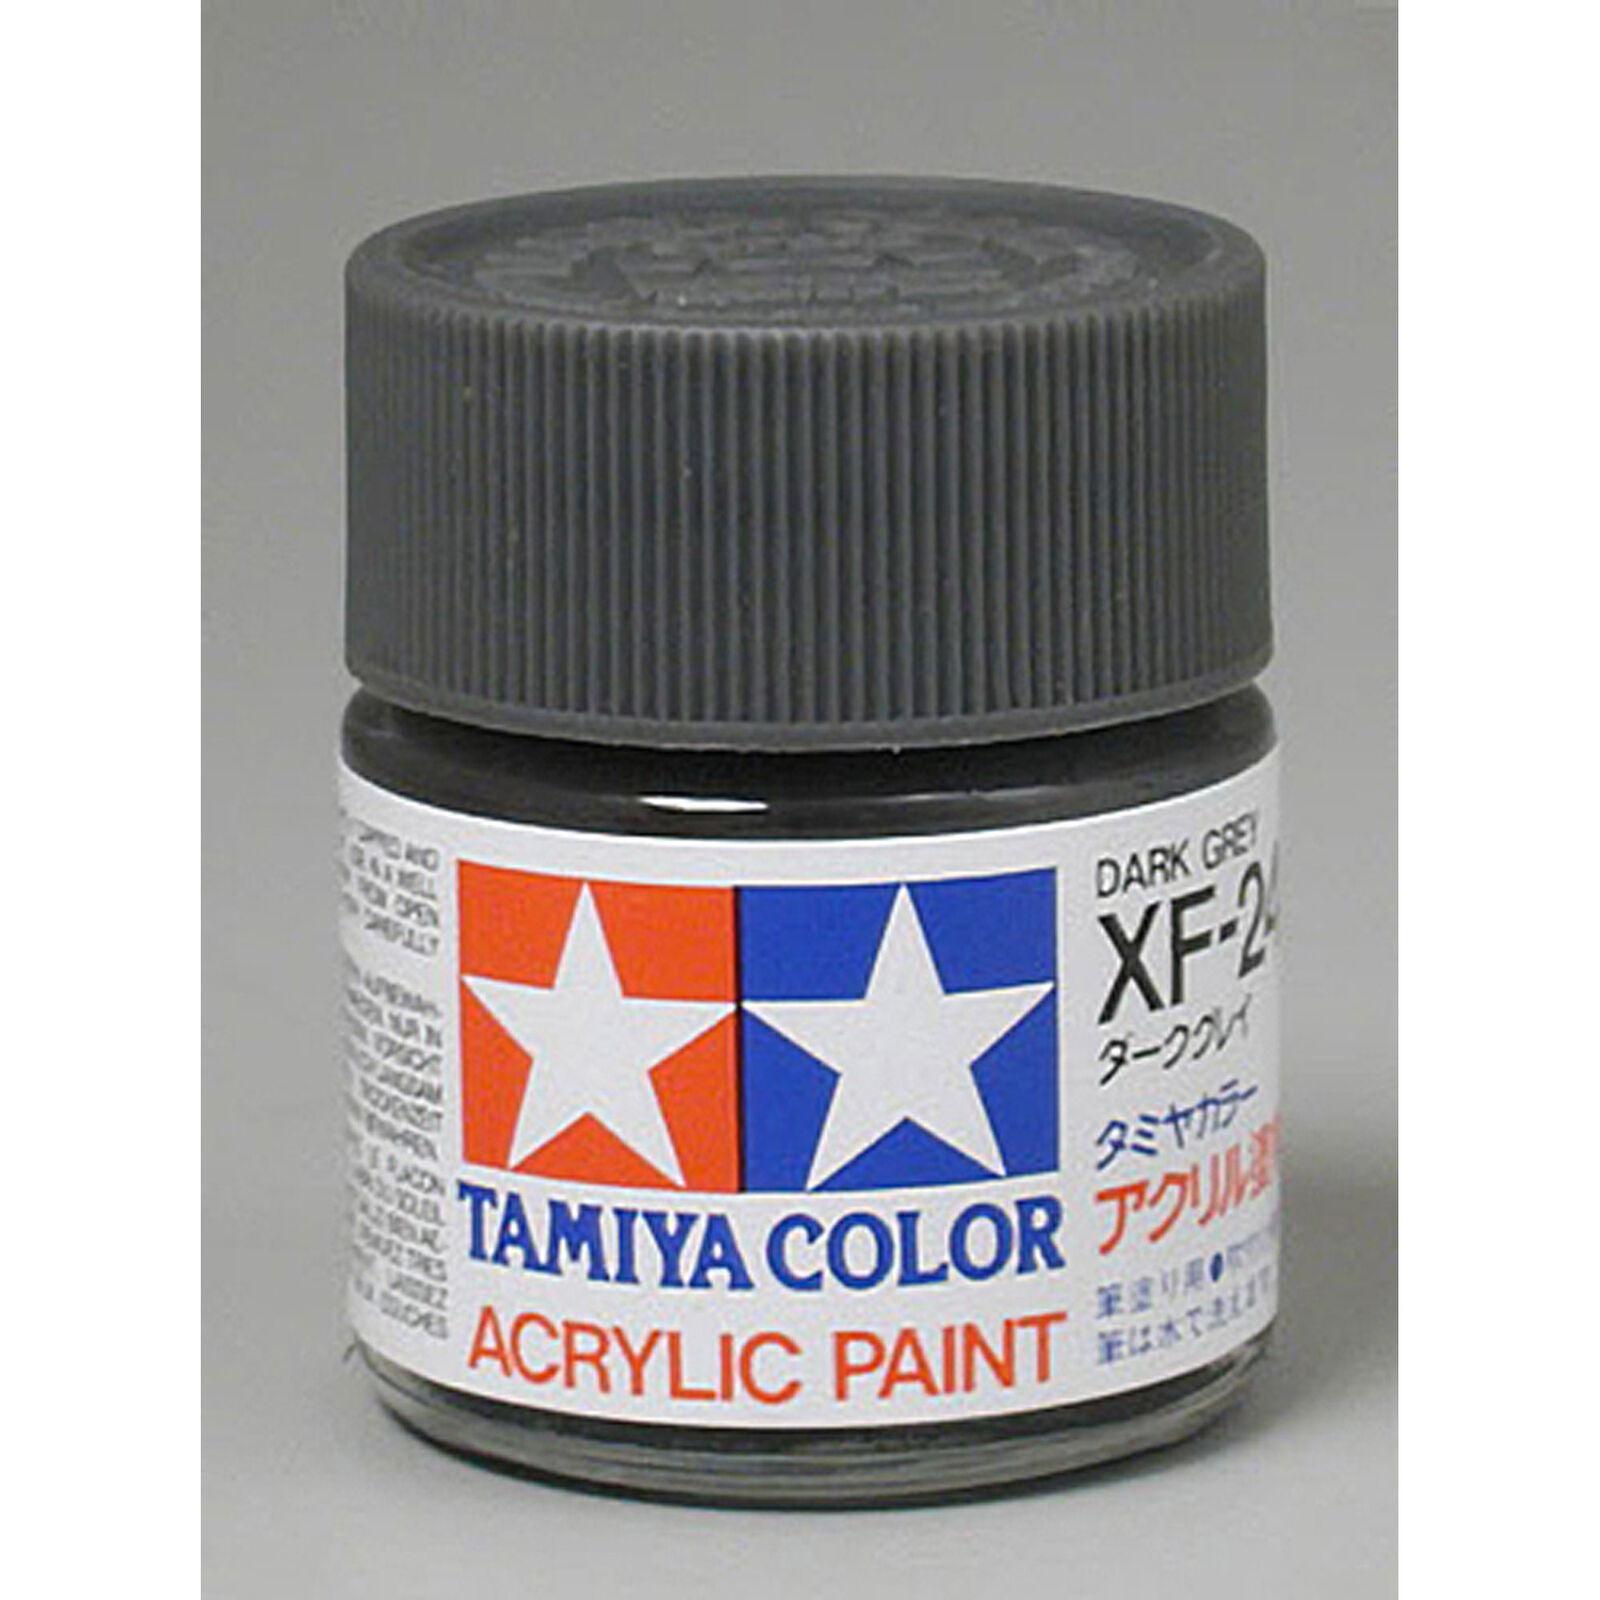 Acrylic XF24, Flat Dark Gray